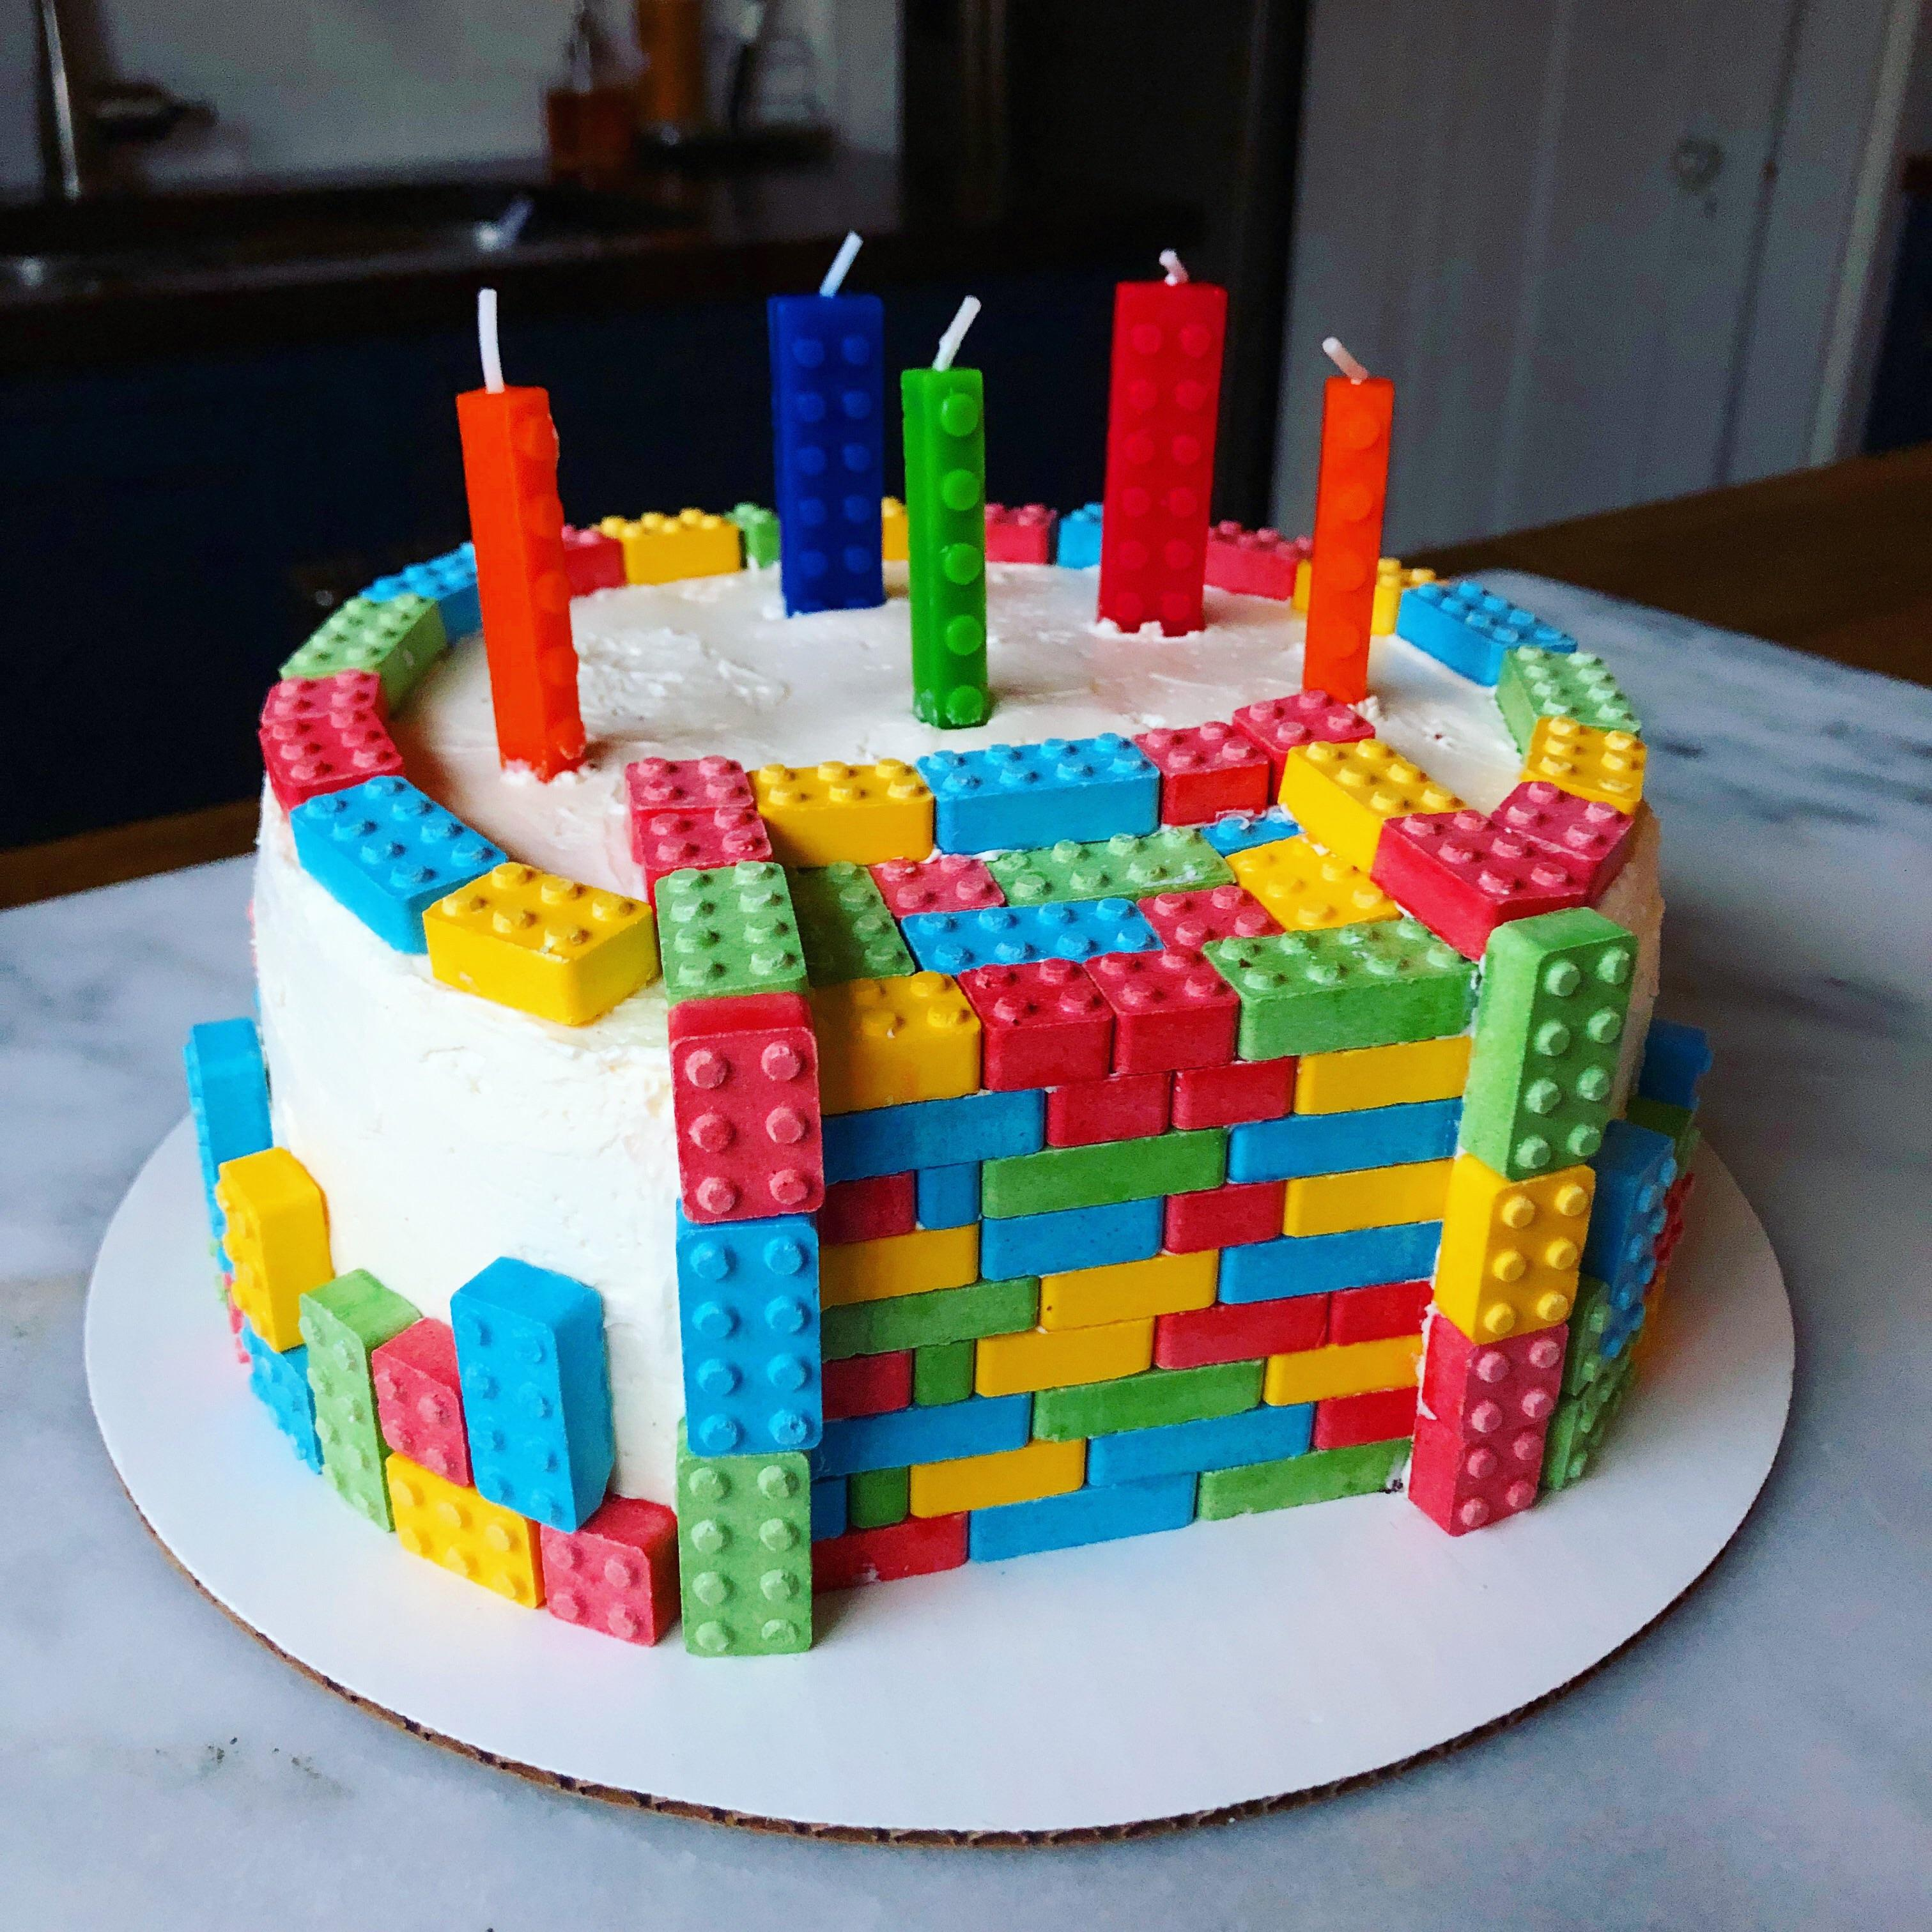 Homemade Lego Cake Food